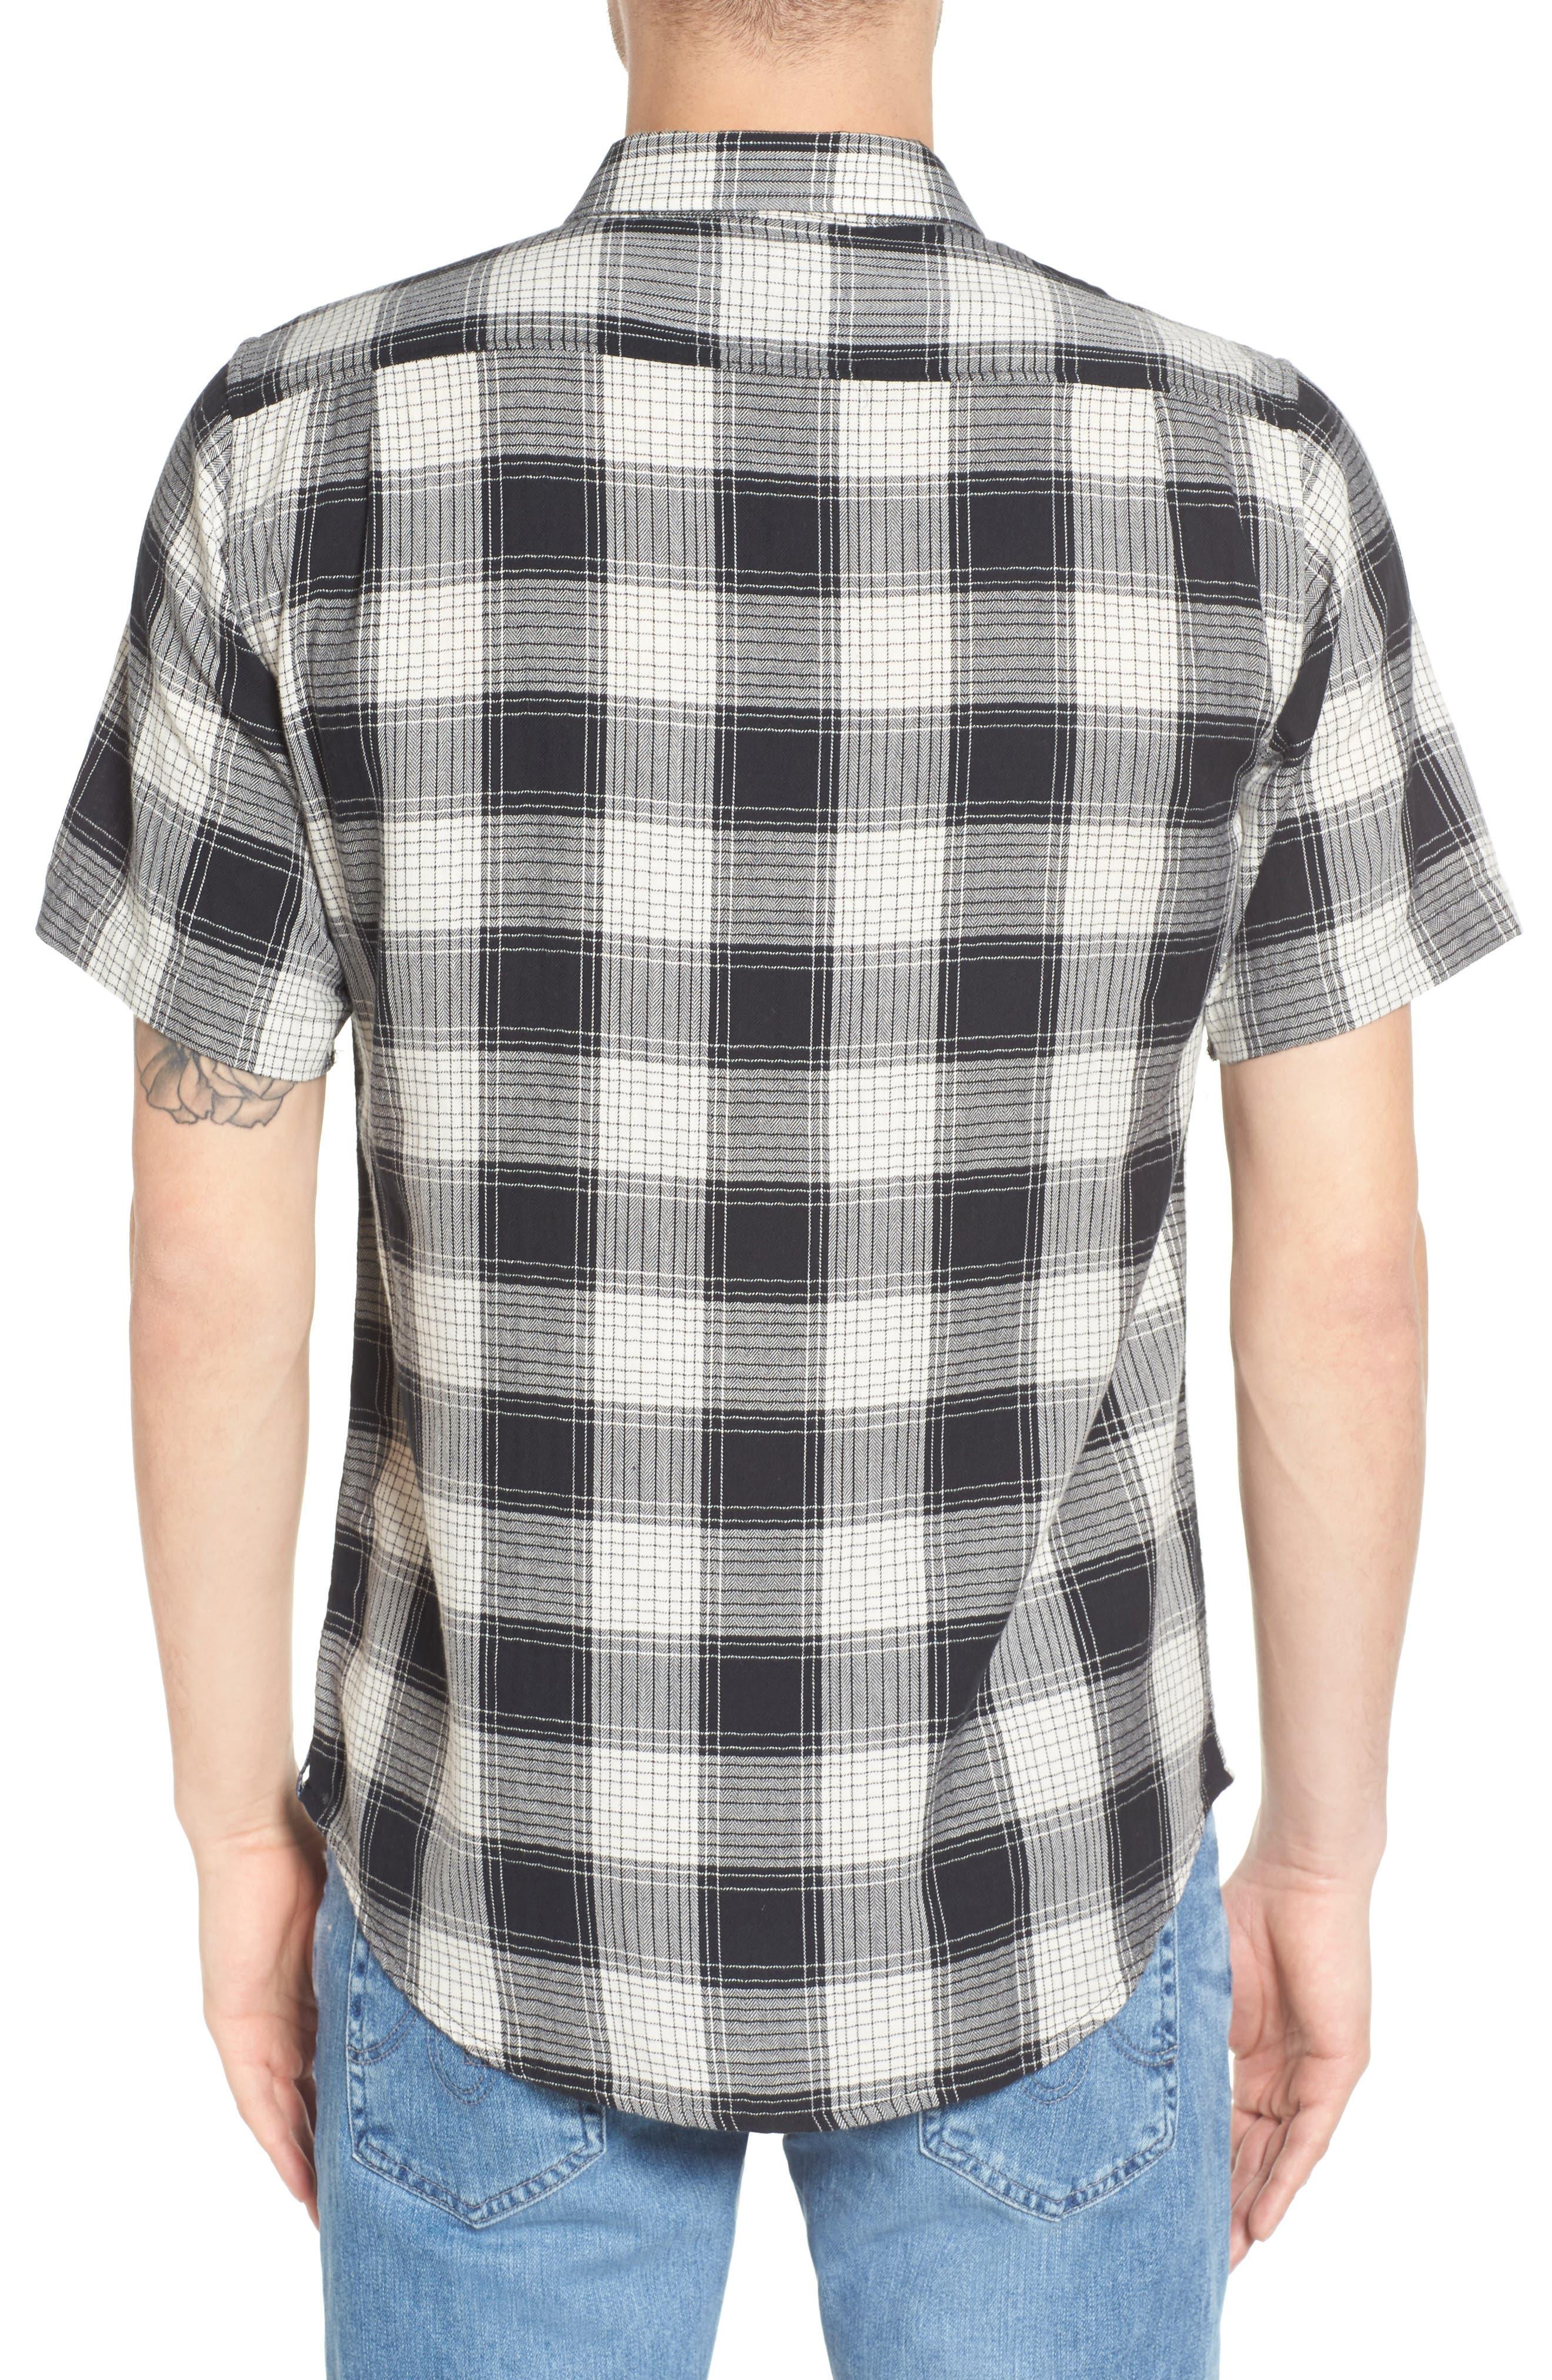 Herringbone Woven Plaid Shirt,                             Alternate thumbnail 2, color,                             100